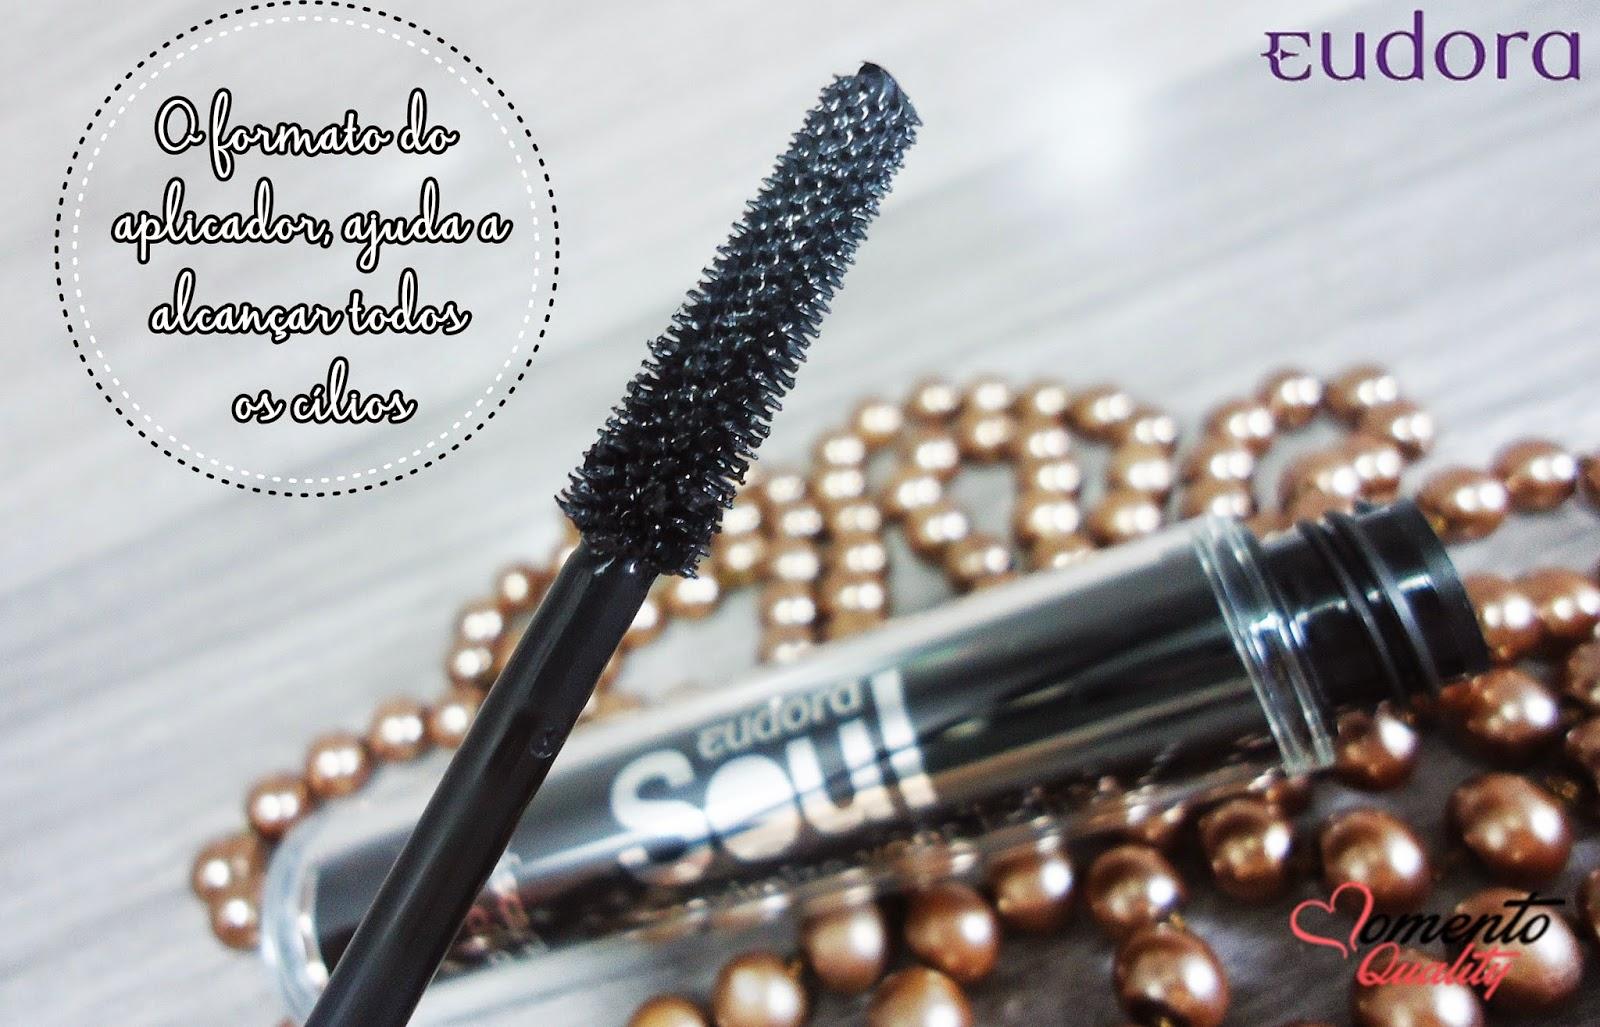 Mascara Maximize Your Lashes Turbo 5.0 Eudora